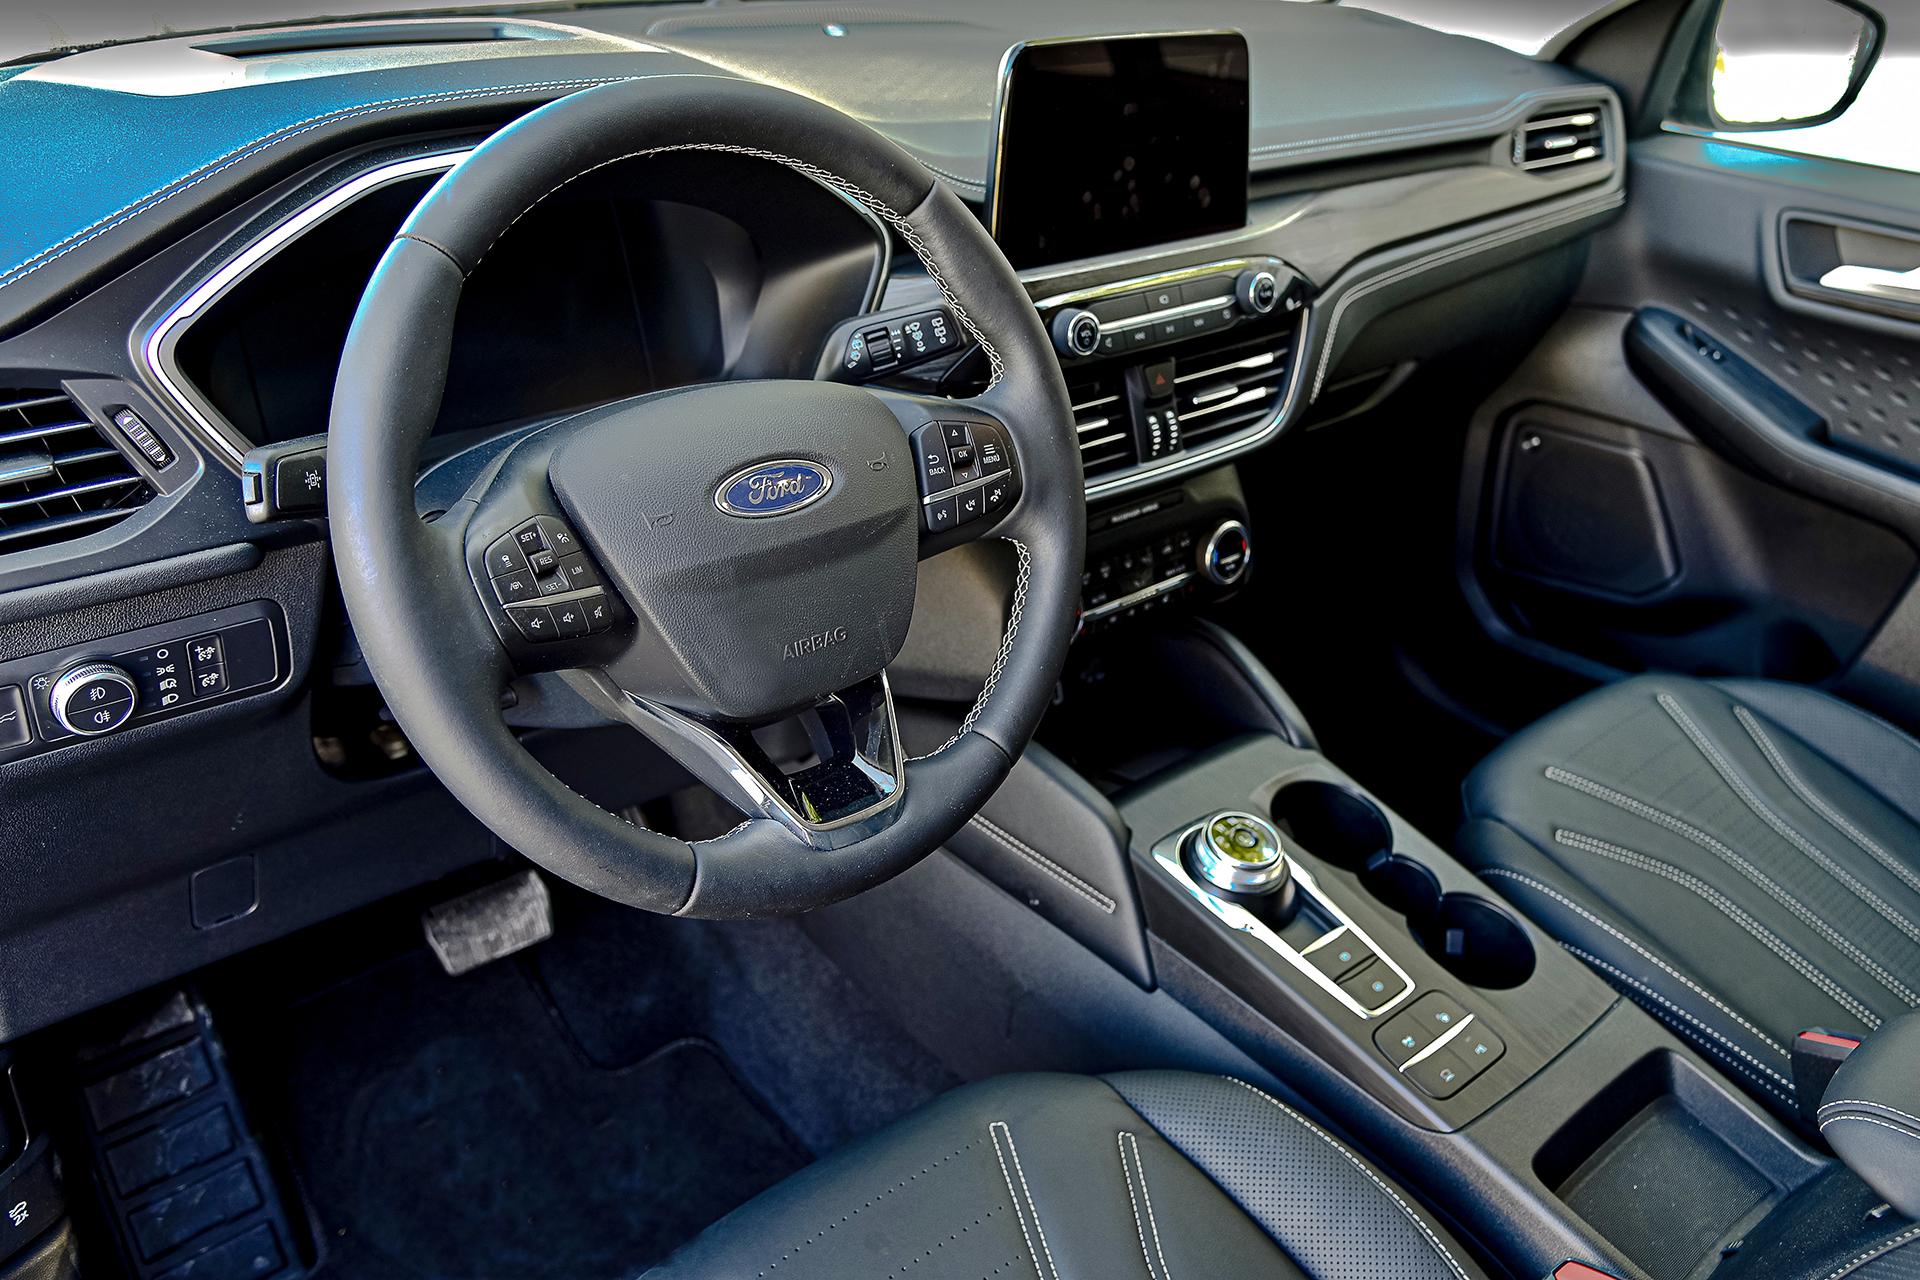 Ford Kuga FHEV